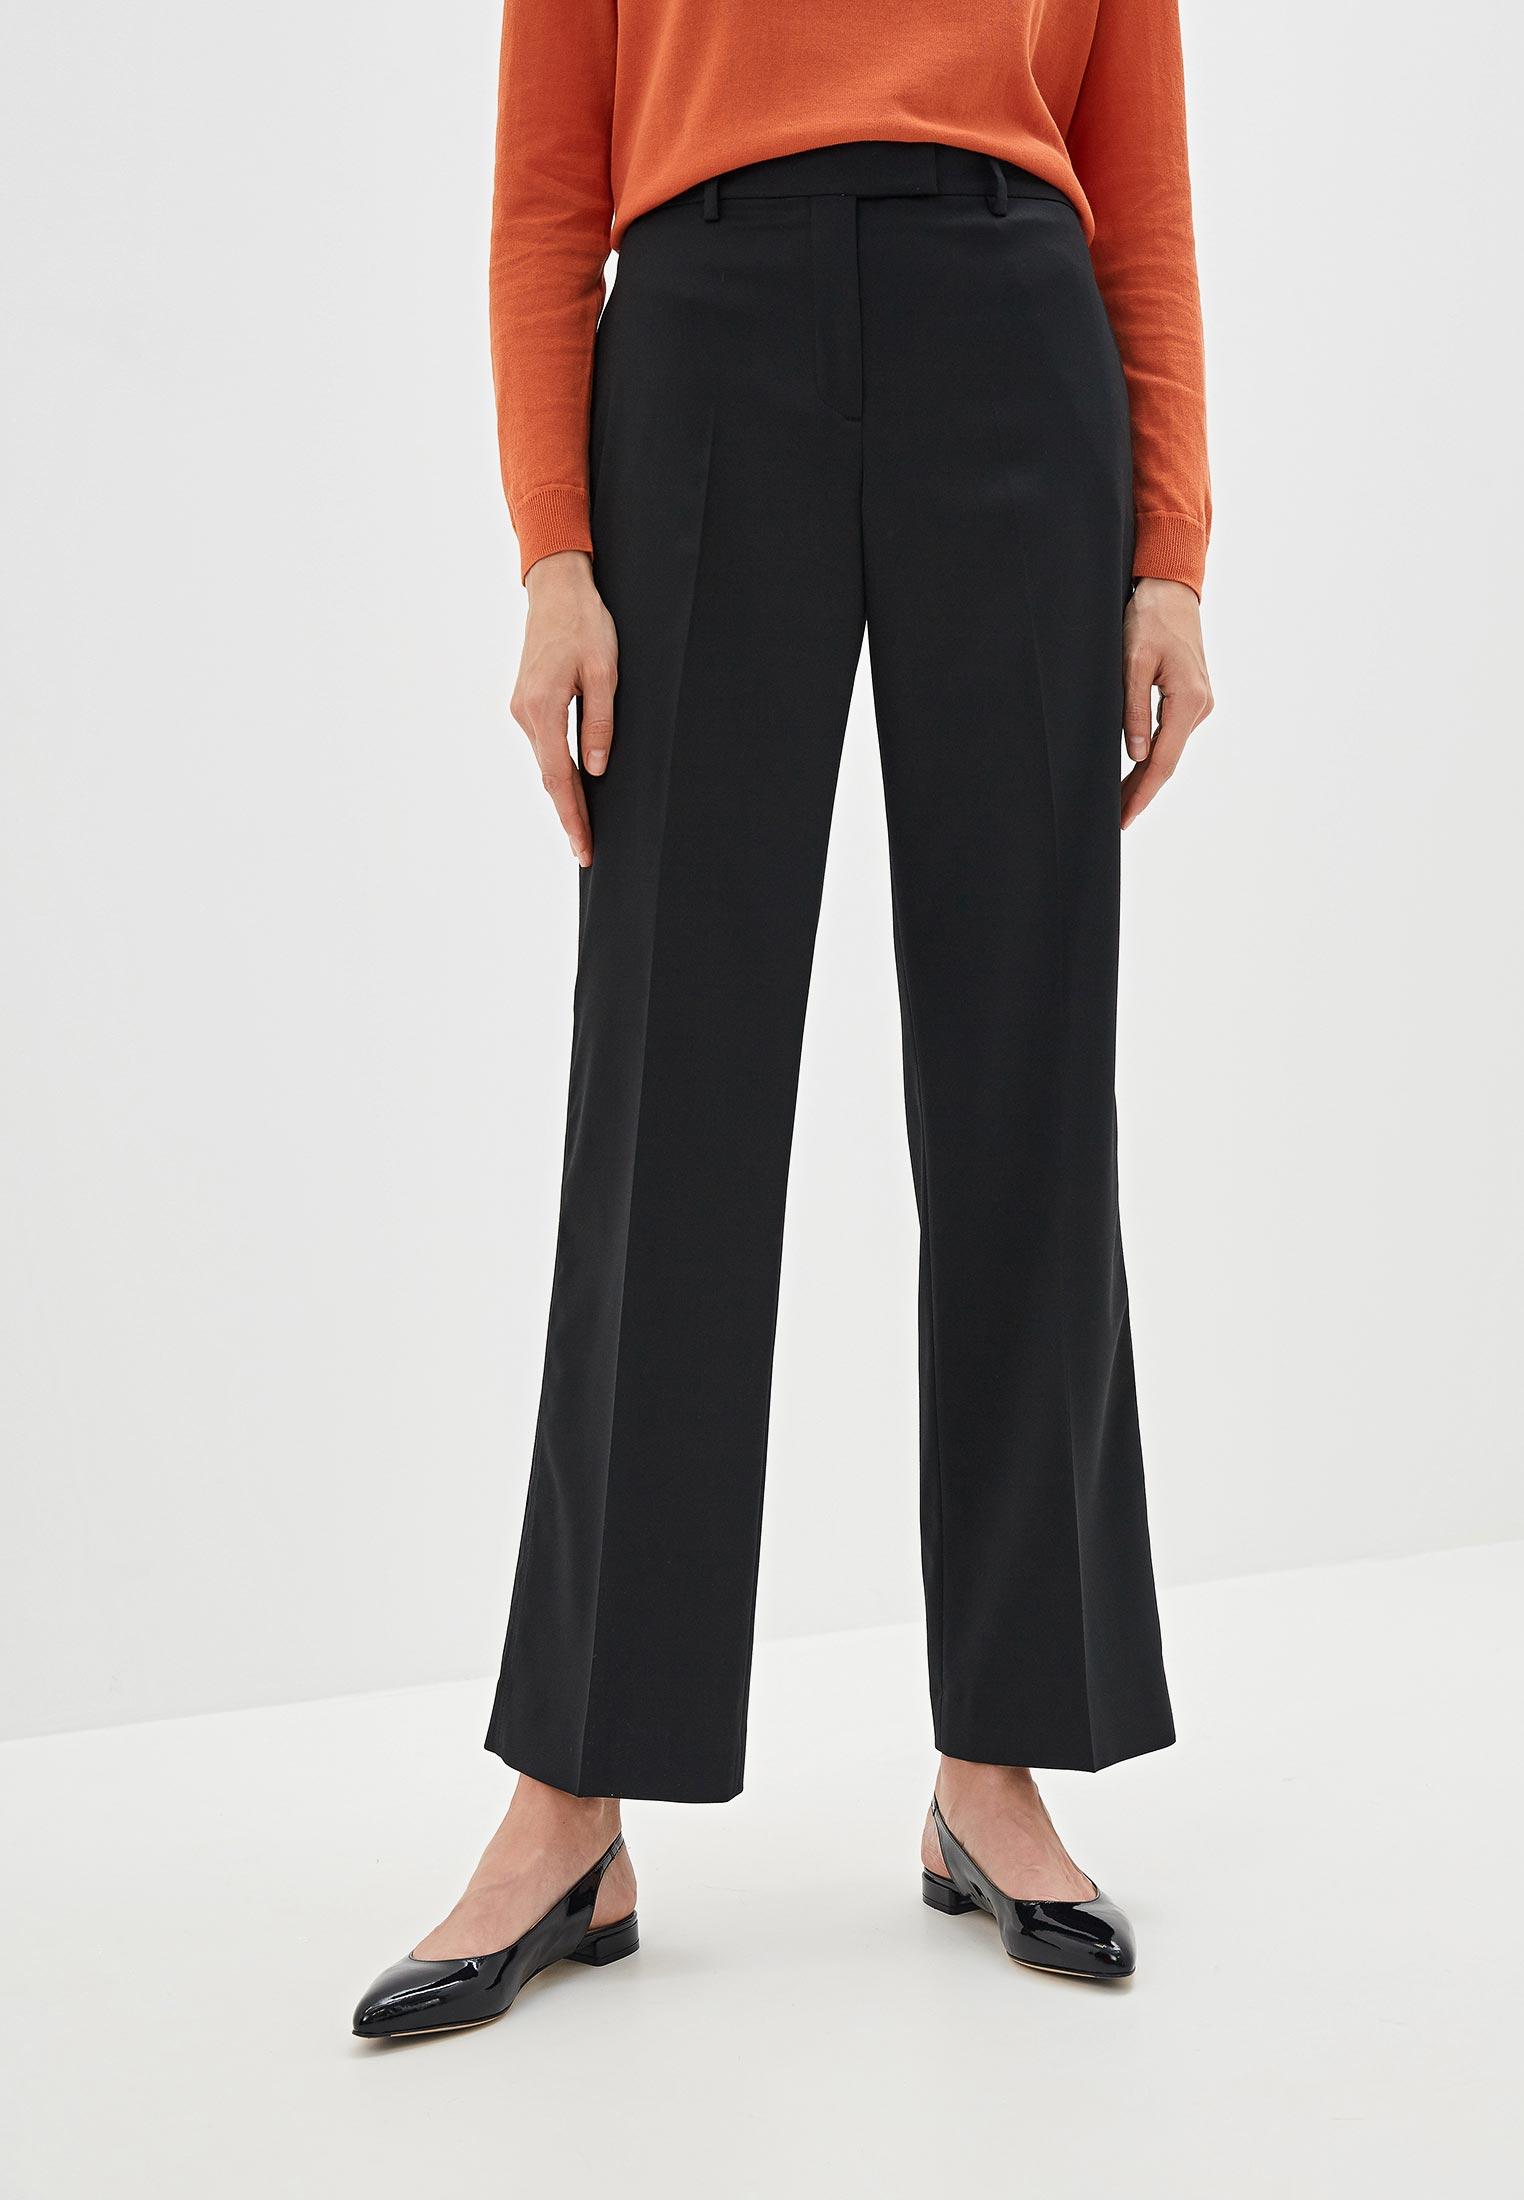 Женские классические брюки Calvin Klein (Кельвин Кляйн) K20K200830